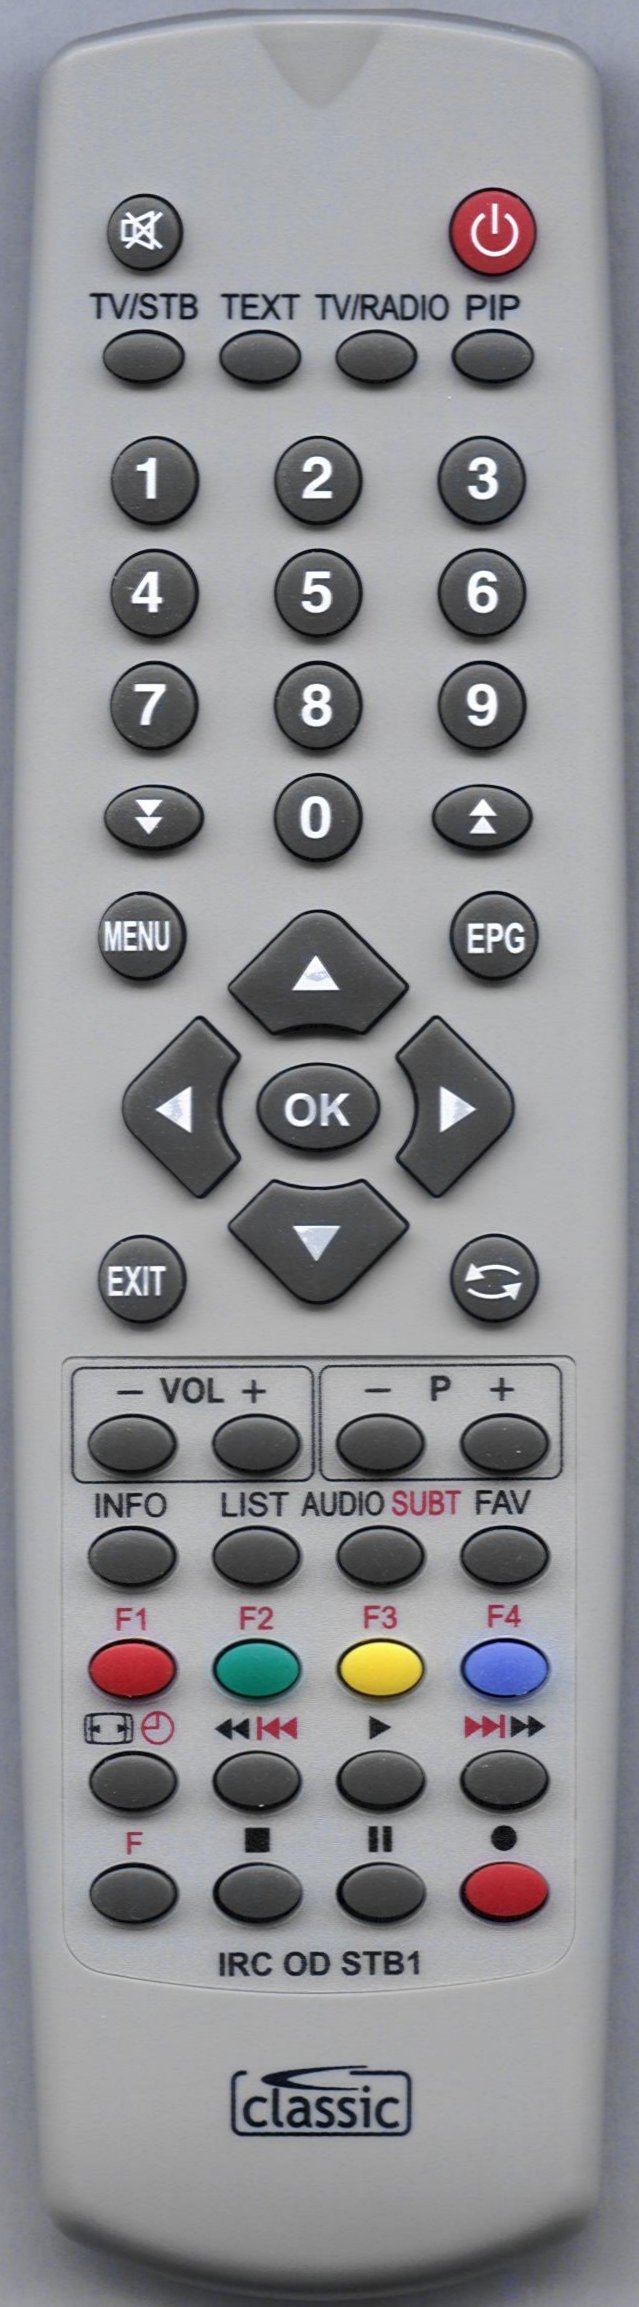 Topfield TF 7710HDPVR Remote Control